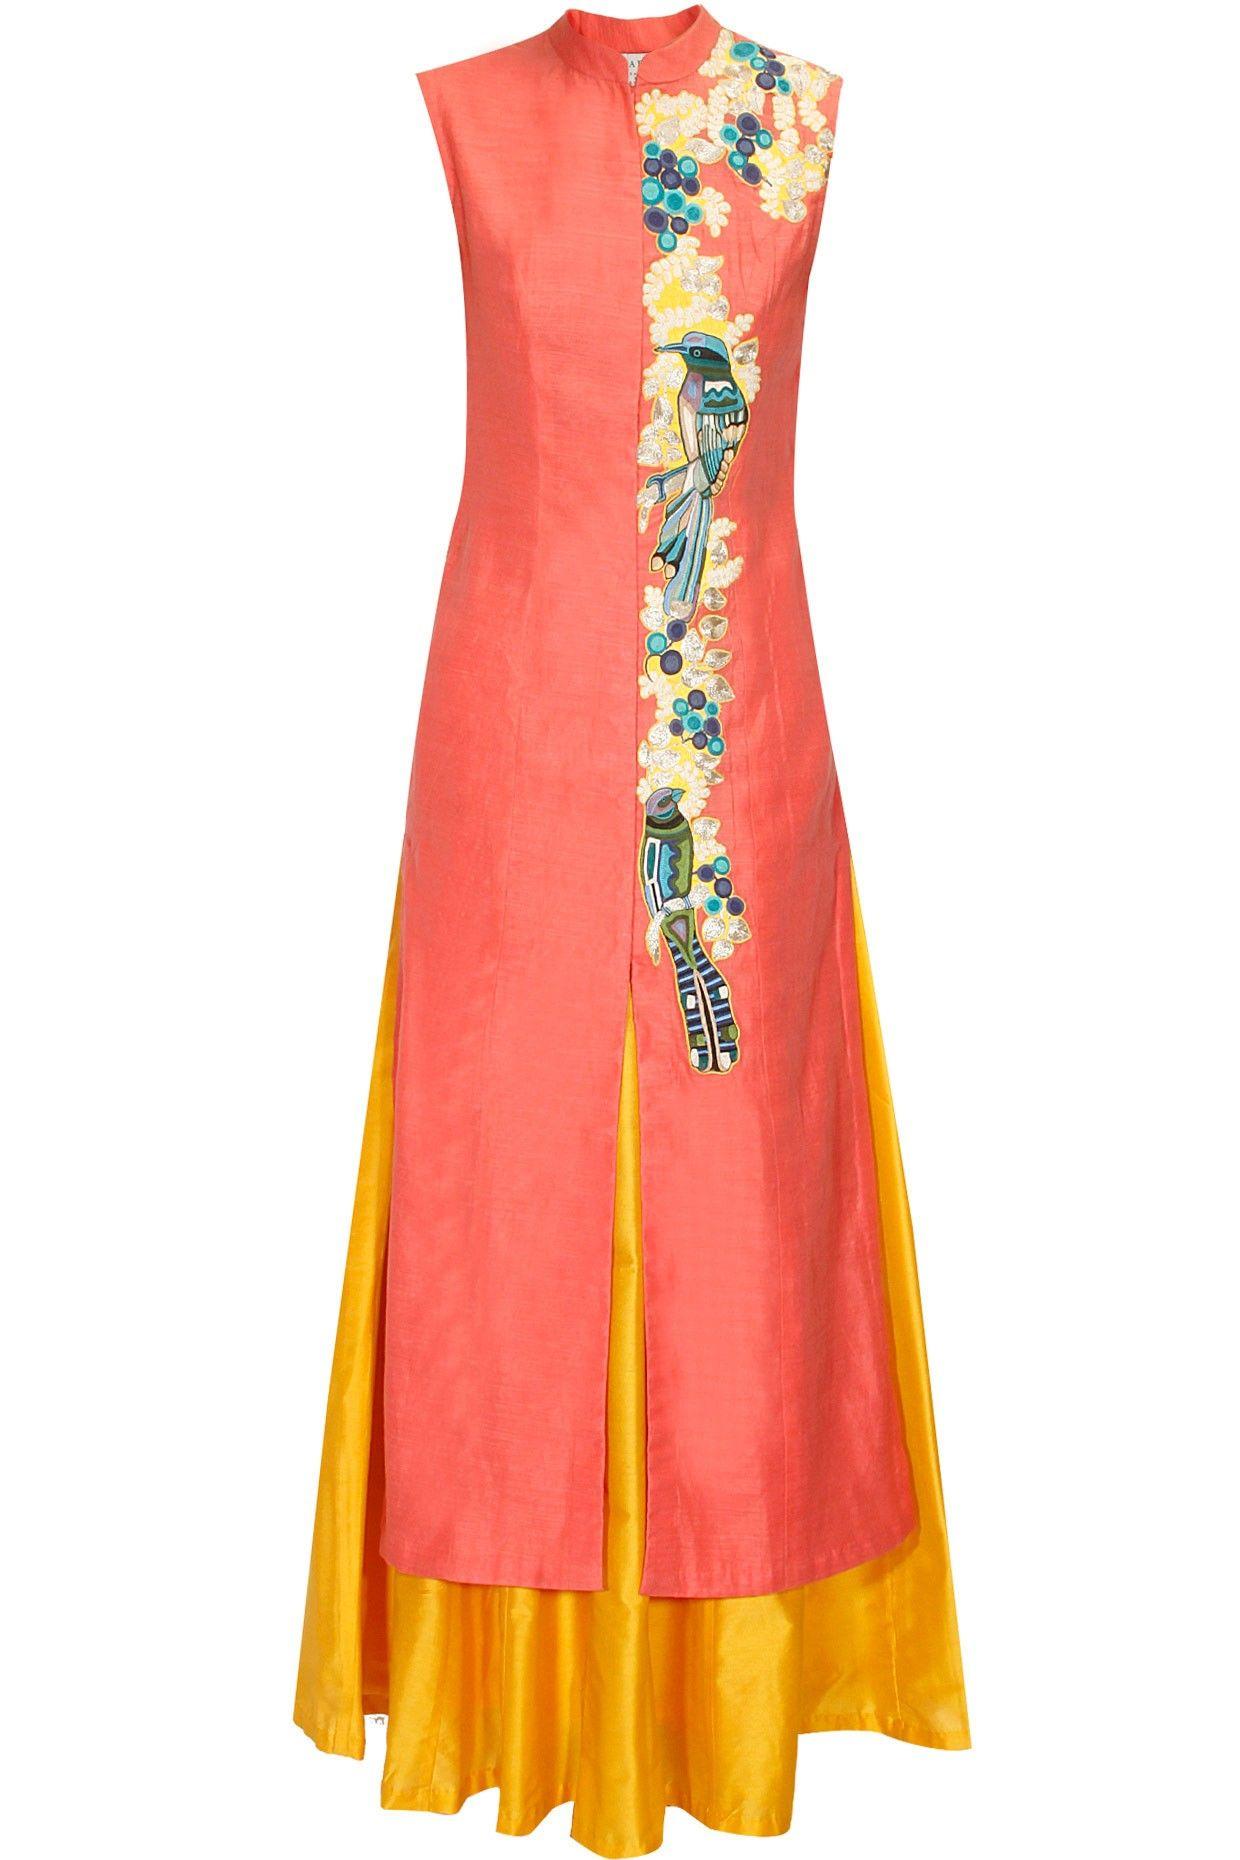 Coral Pink Embroidered Achkan Kurta With Yellow Lehenga Skirt Available